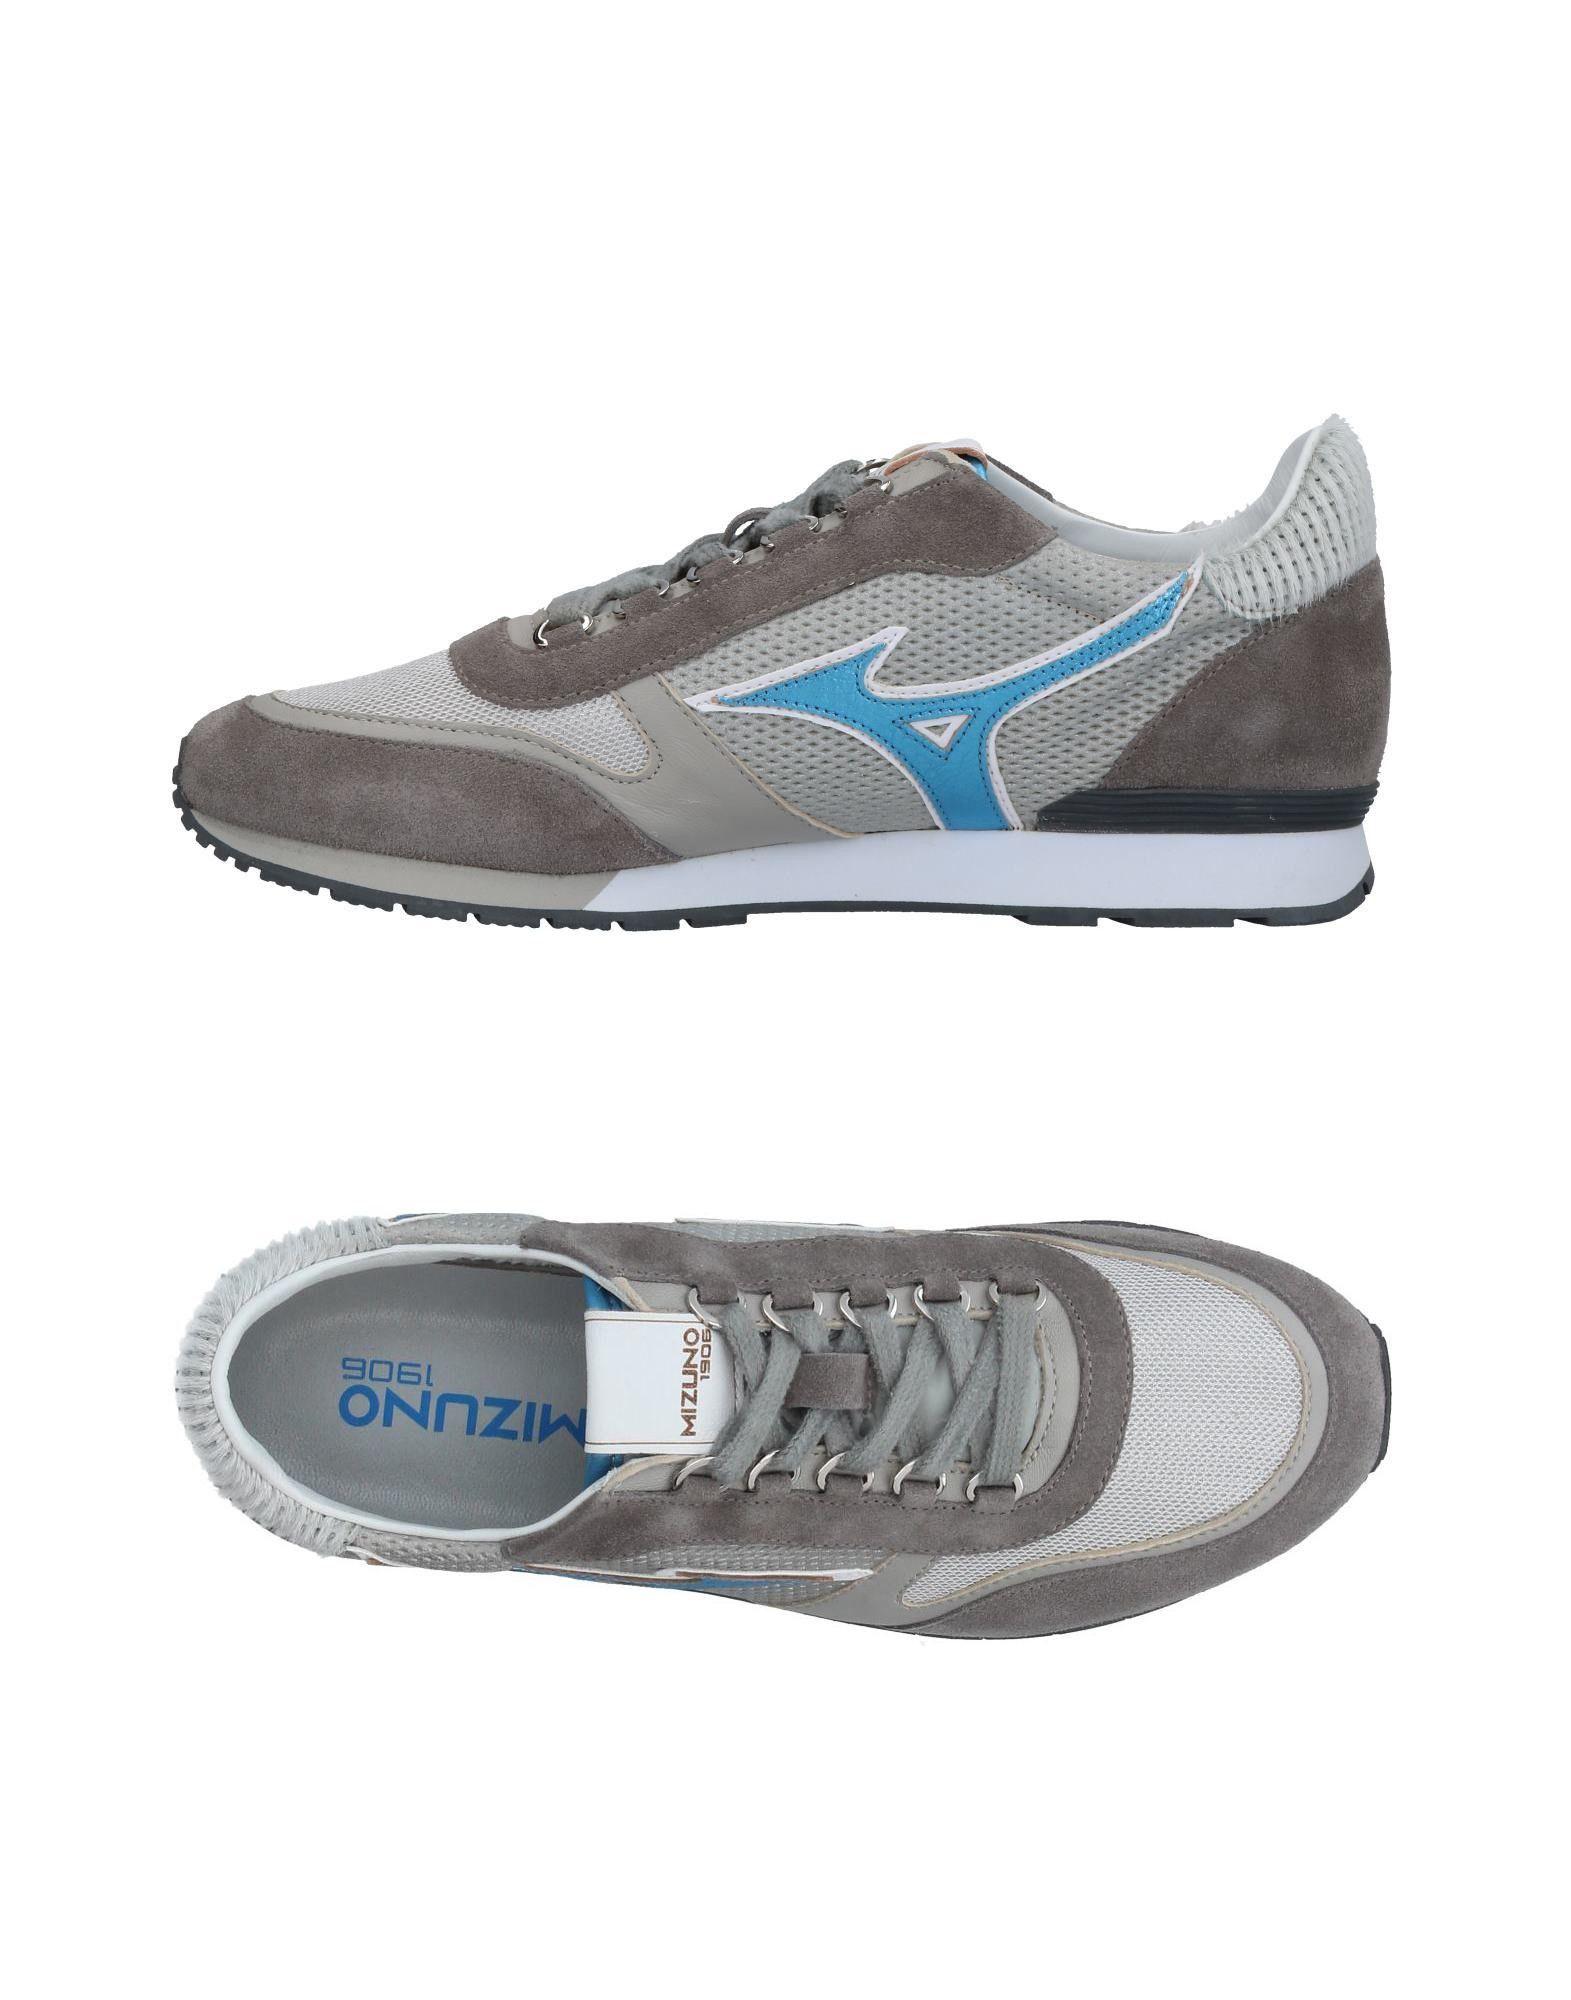 Sneakers Mizuno Homme - Sneakers Mizuno sur